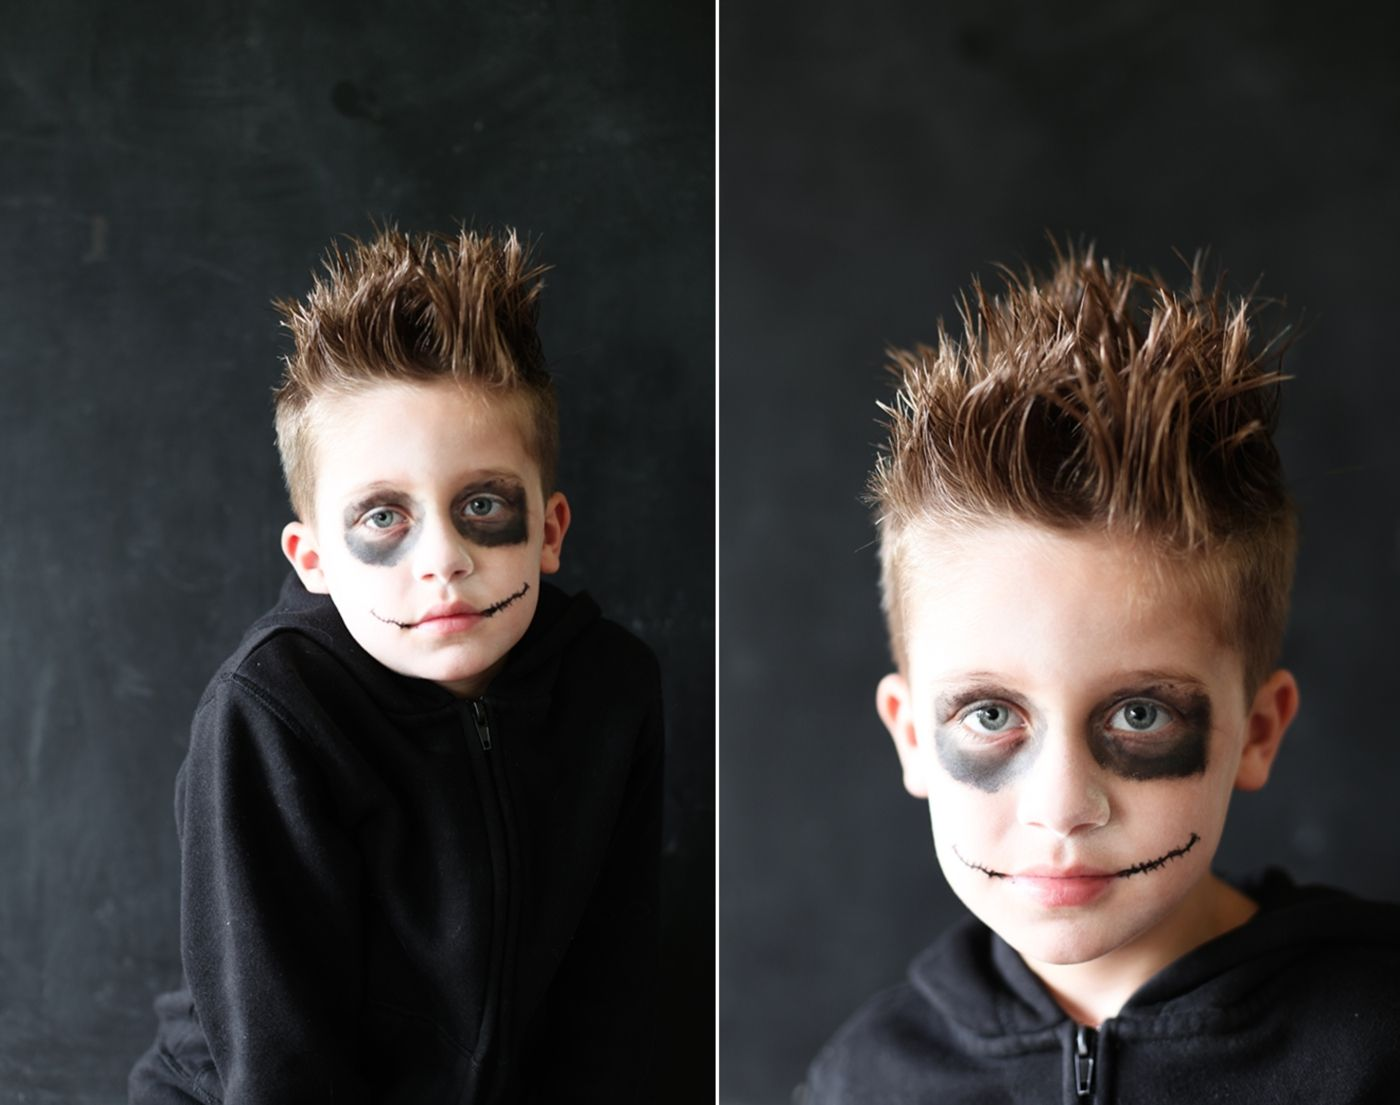 Halloween Frisuren Fur Kinder Idee Fur Jungs Fur Zombie Vampir Oder Werwolfkostum Halloween Kostume Kinder Halloween Frisuren Halloween